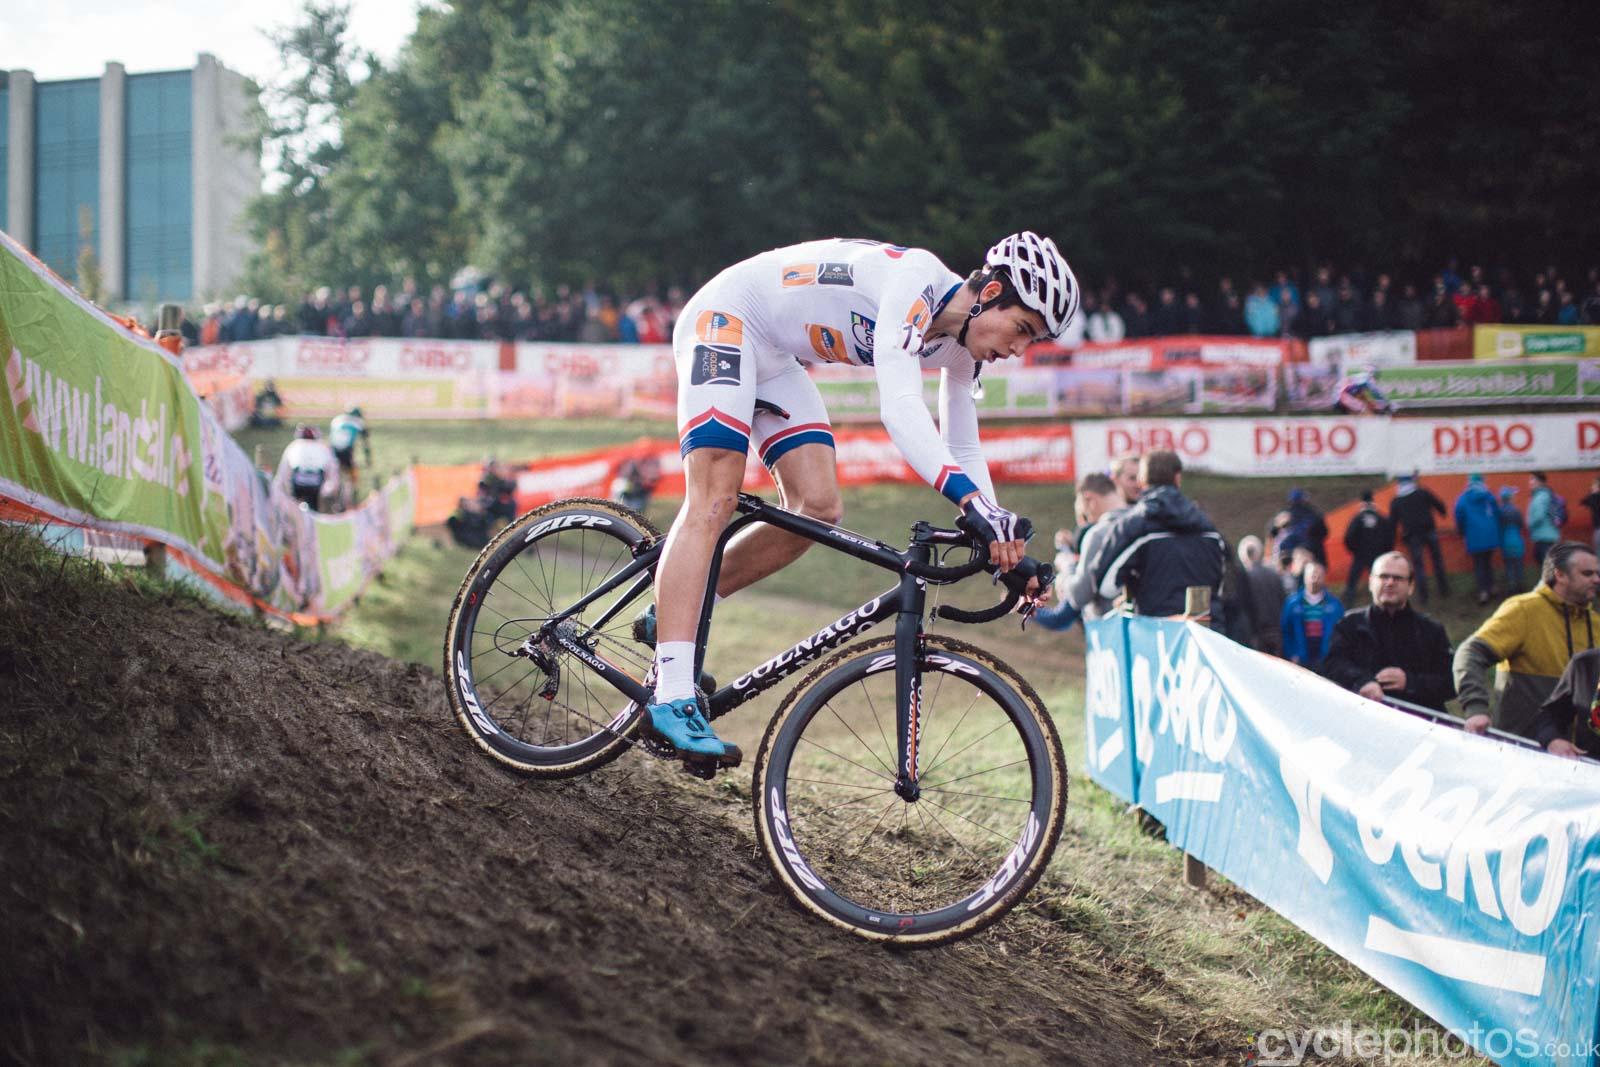 2015-cyclephotos-cyclocross-valkenburg-150855-wout-van-aert